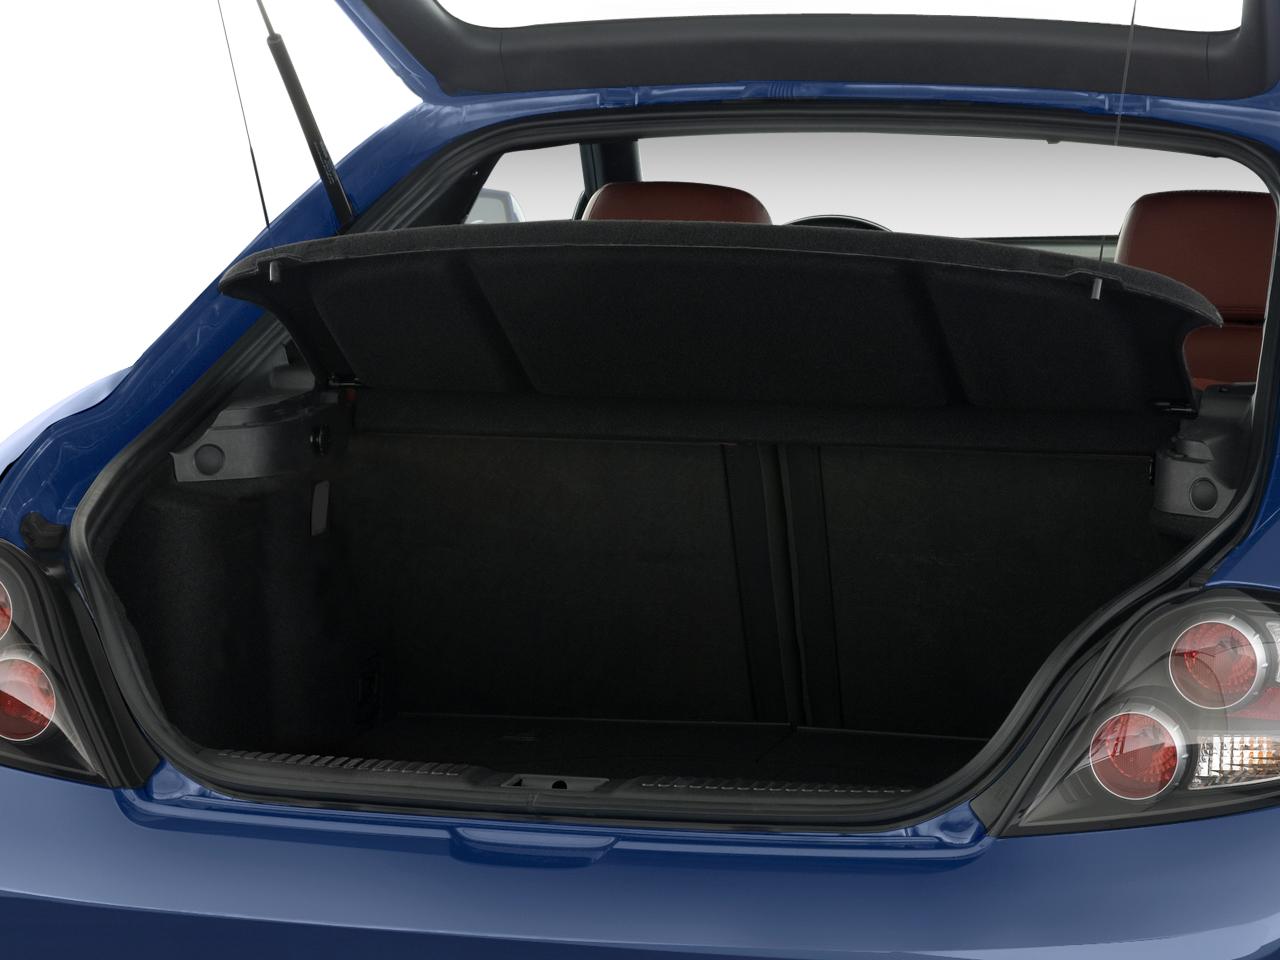 2008 Hyundai Tiburon GT V6